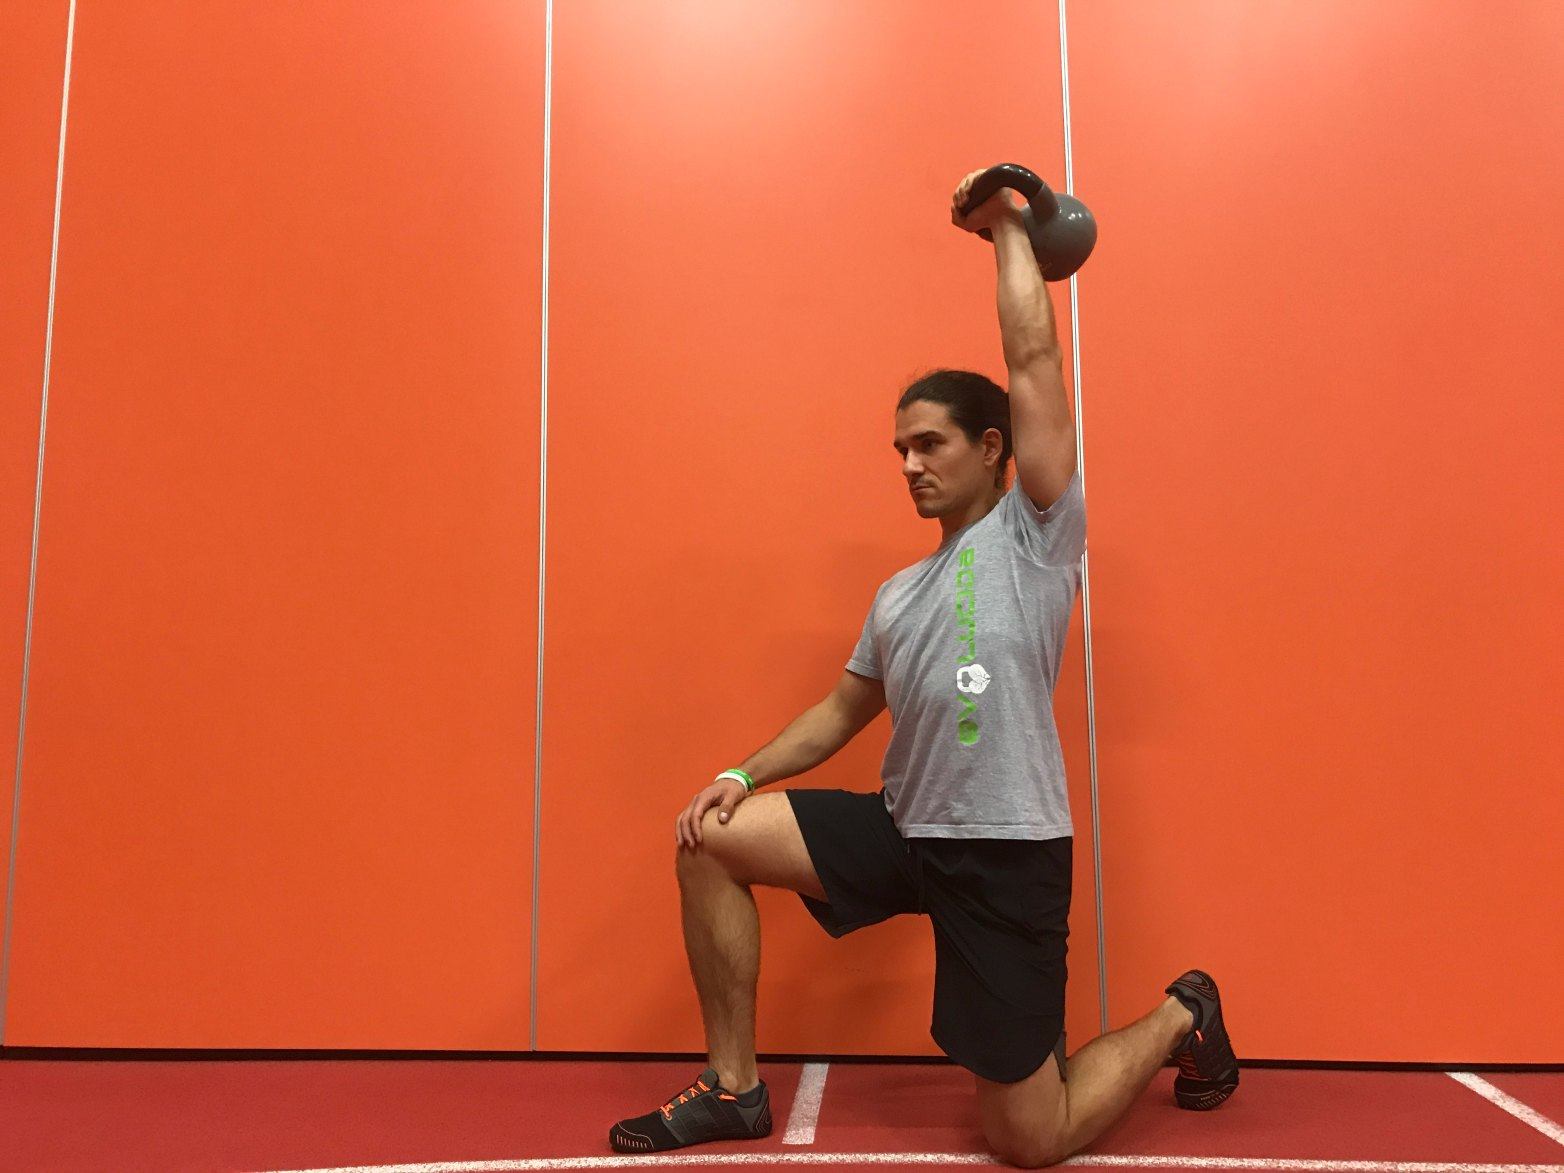 Kako trenirati po rehabilitaciji izpaha rame?